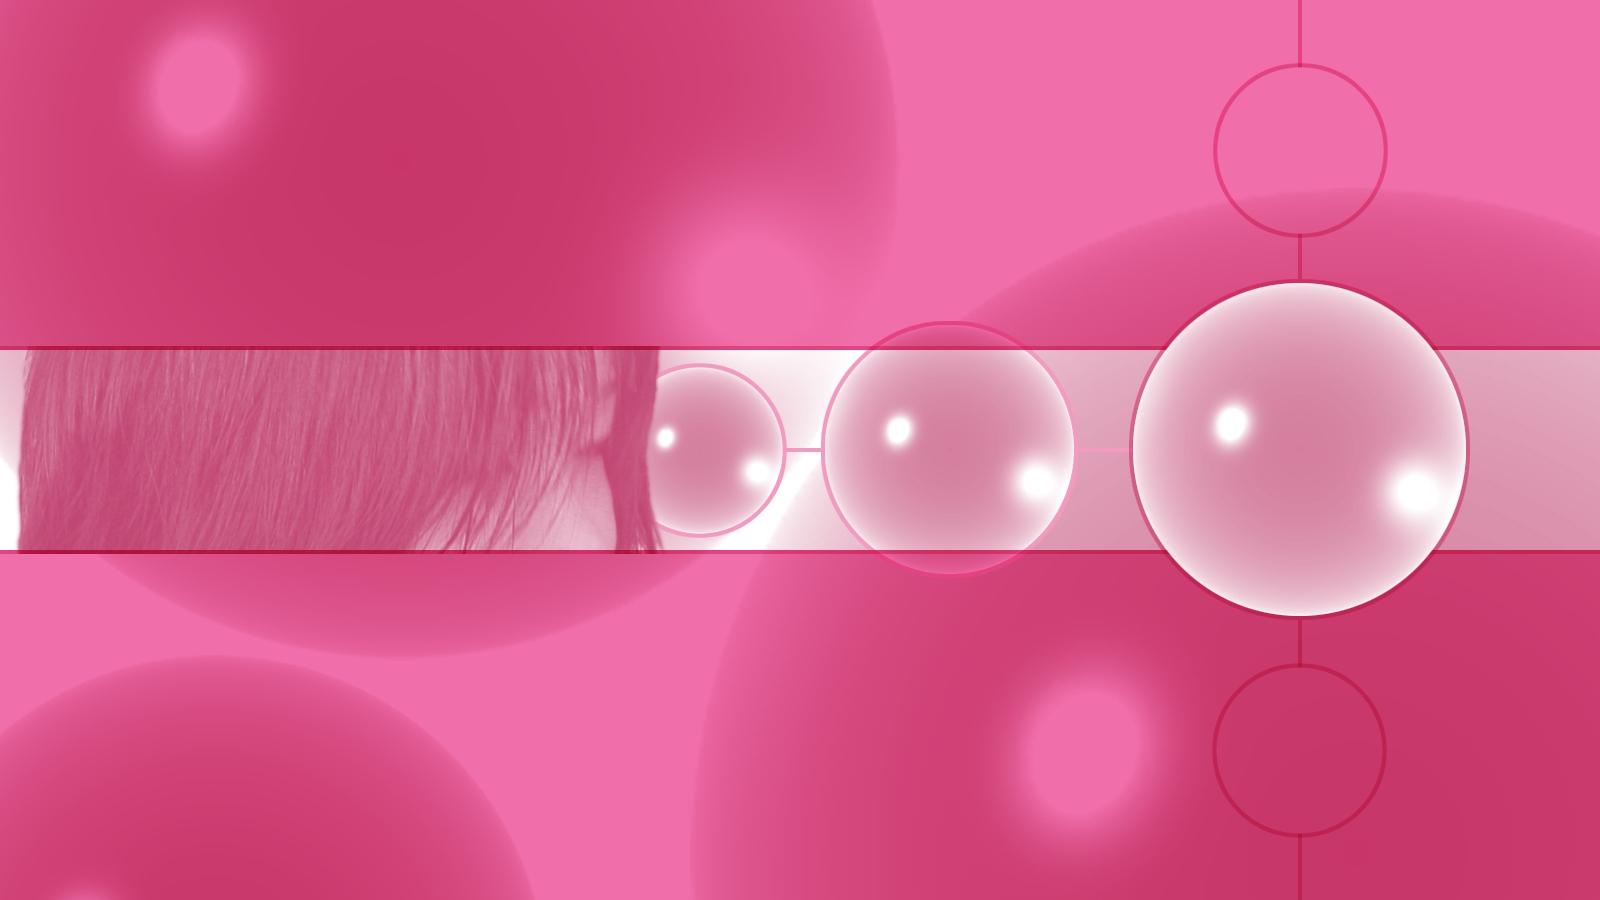 Free download pink wallpaper love pink wallpapers cute pink